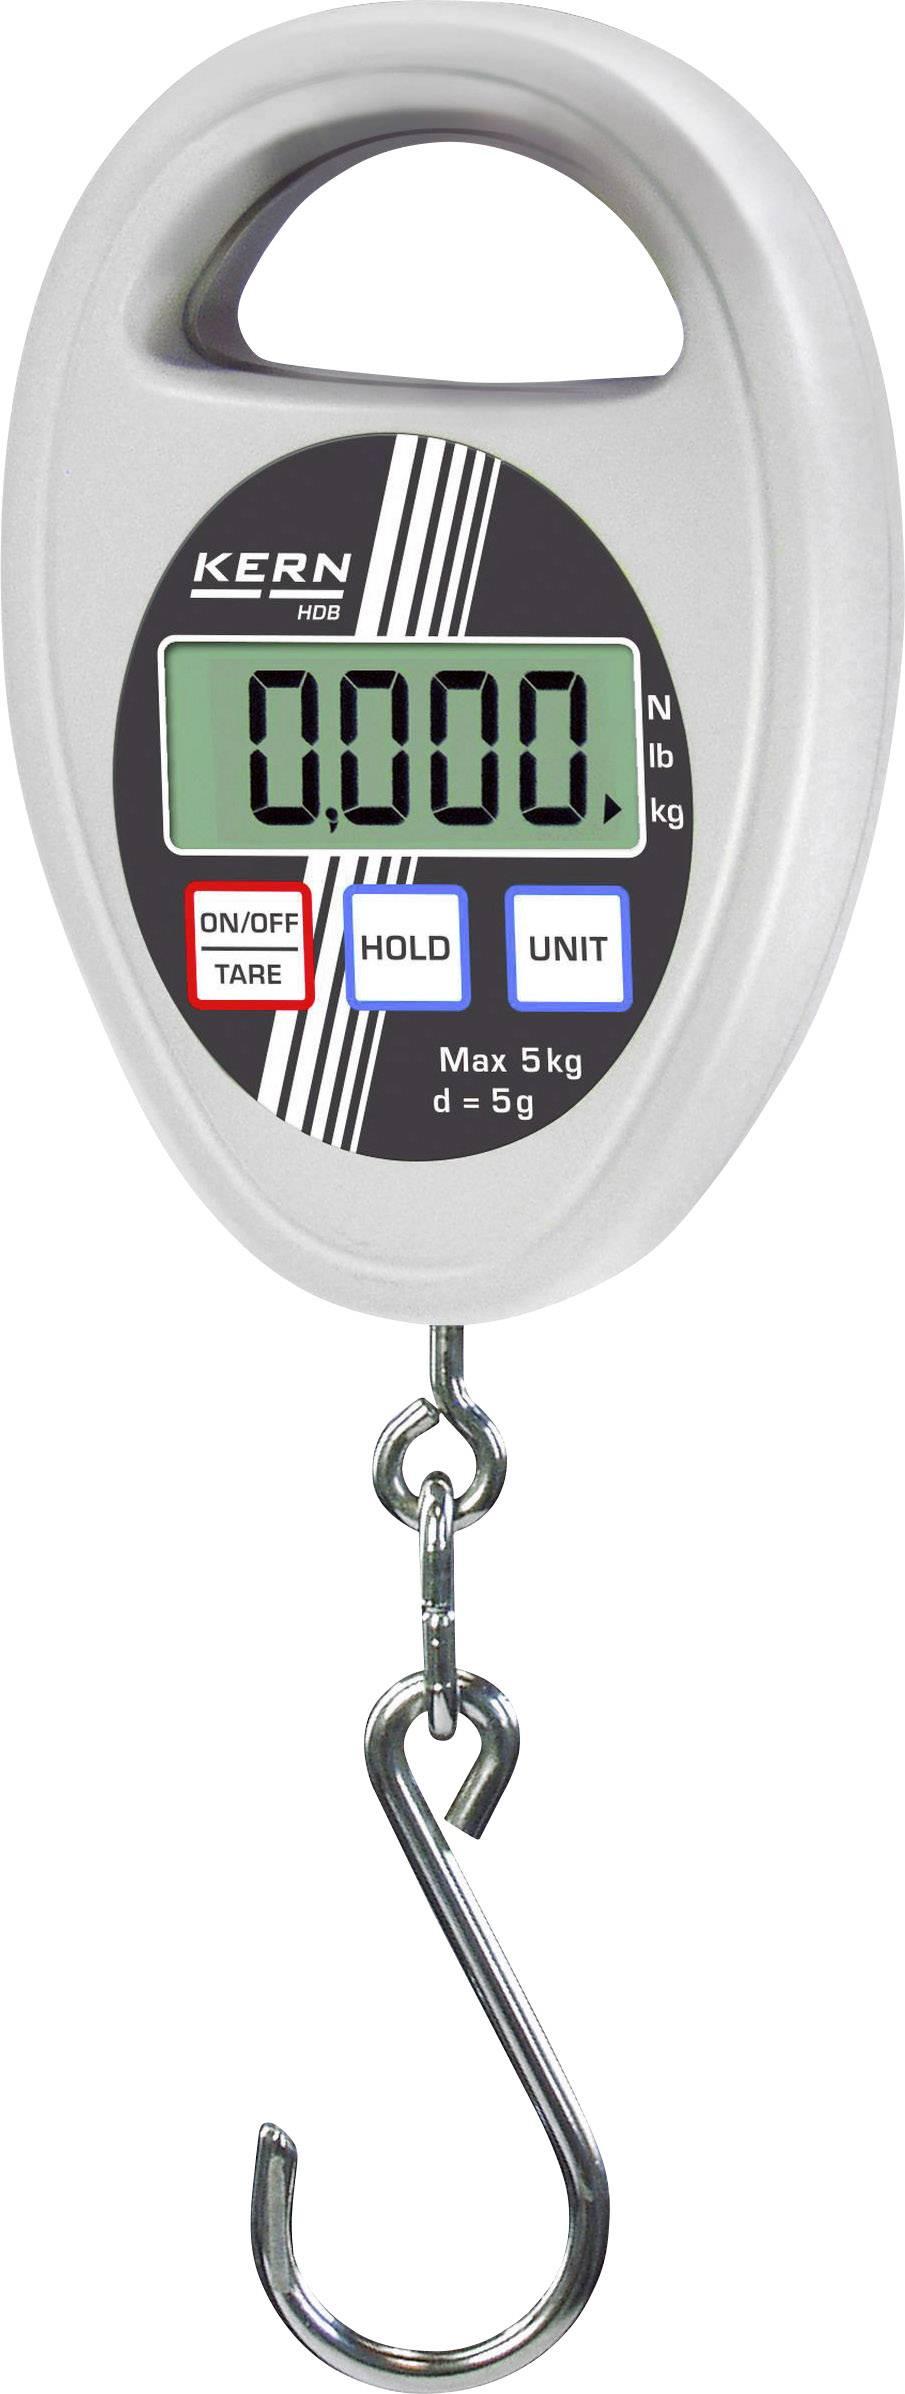 Závěsná váha Kern HDB 5K5, max. 5kg